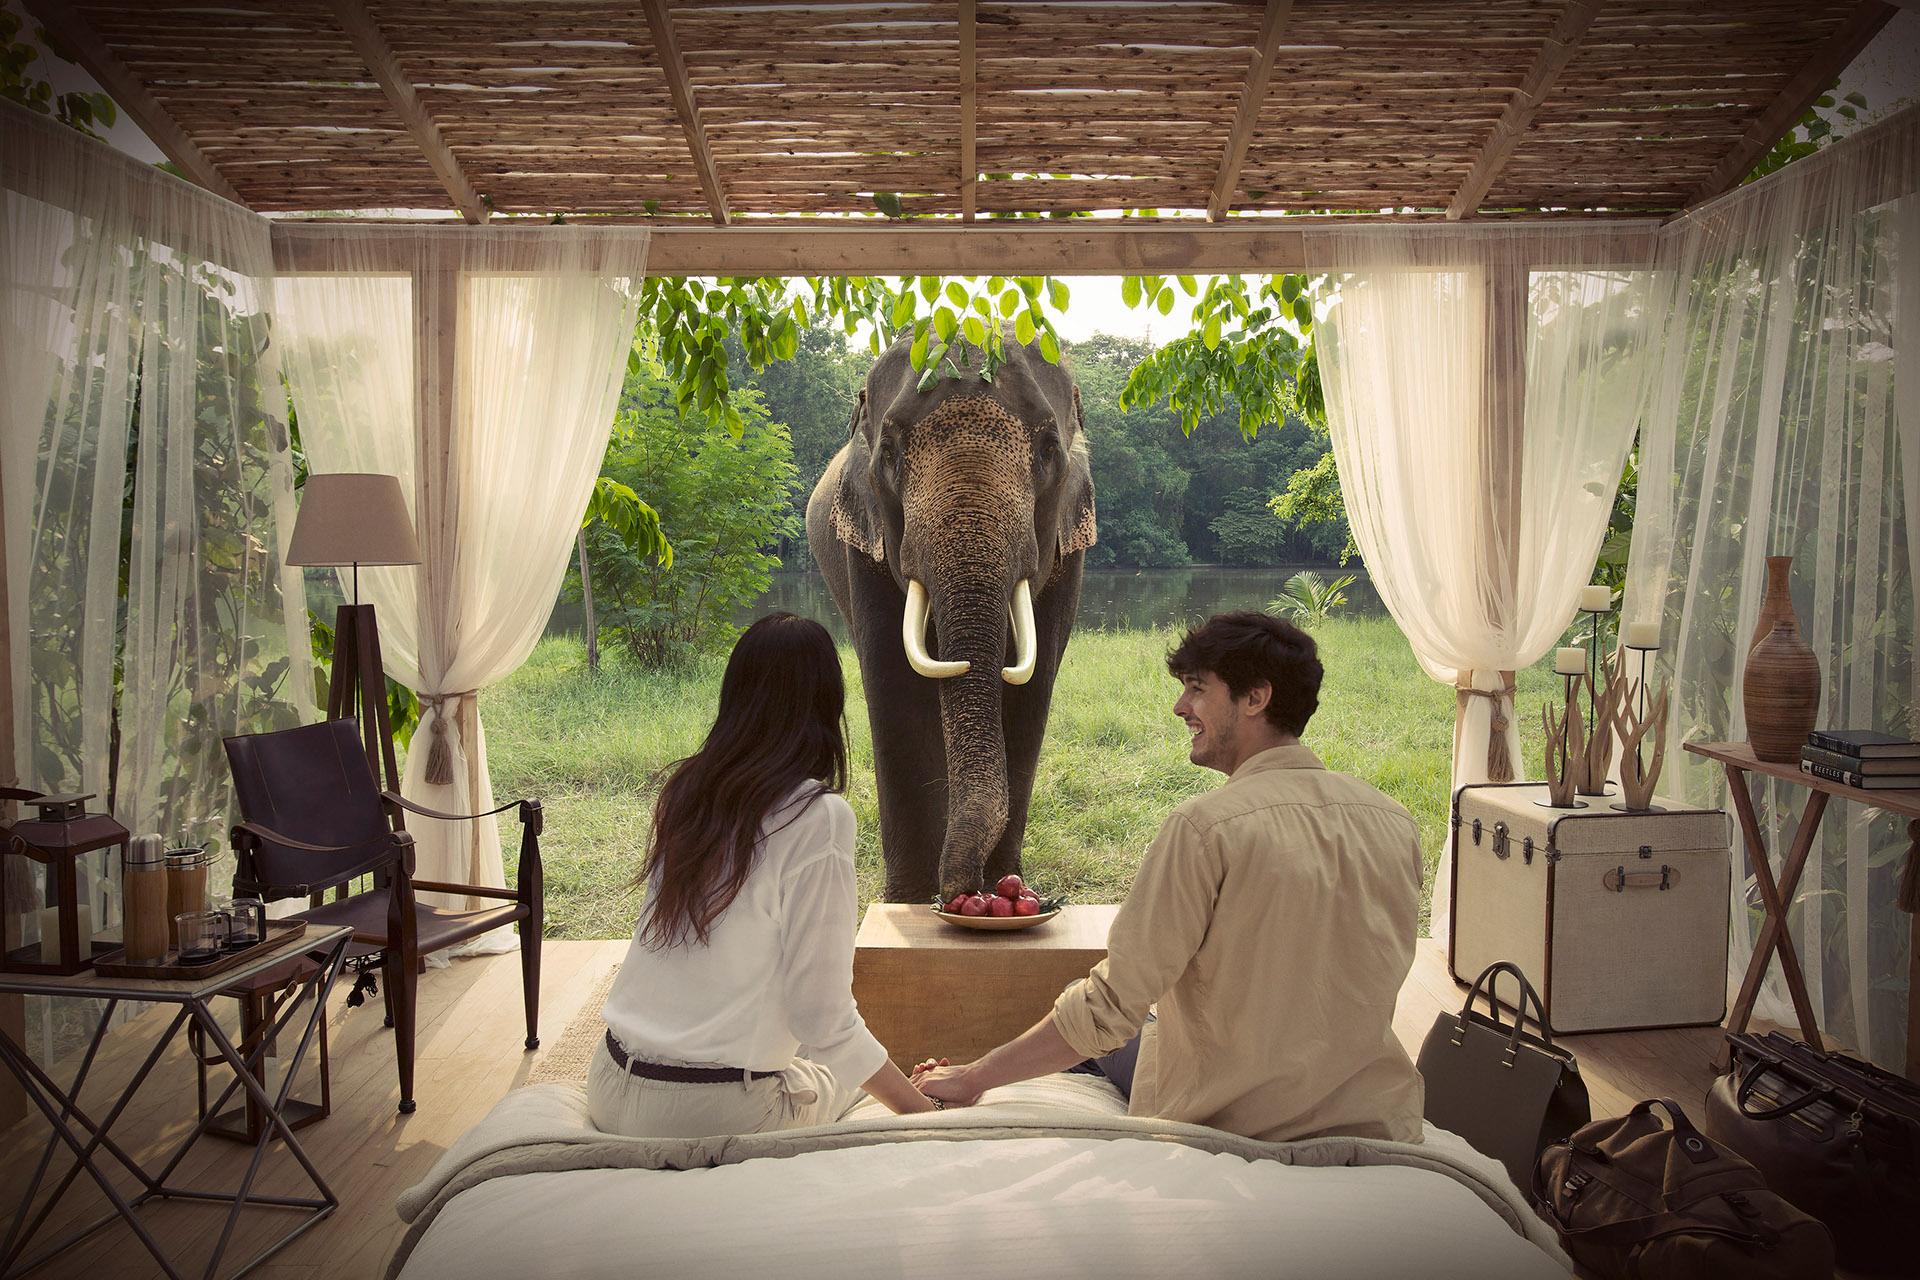 087 VISA_Thailand Elephant 280 210515